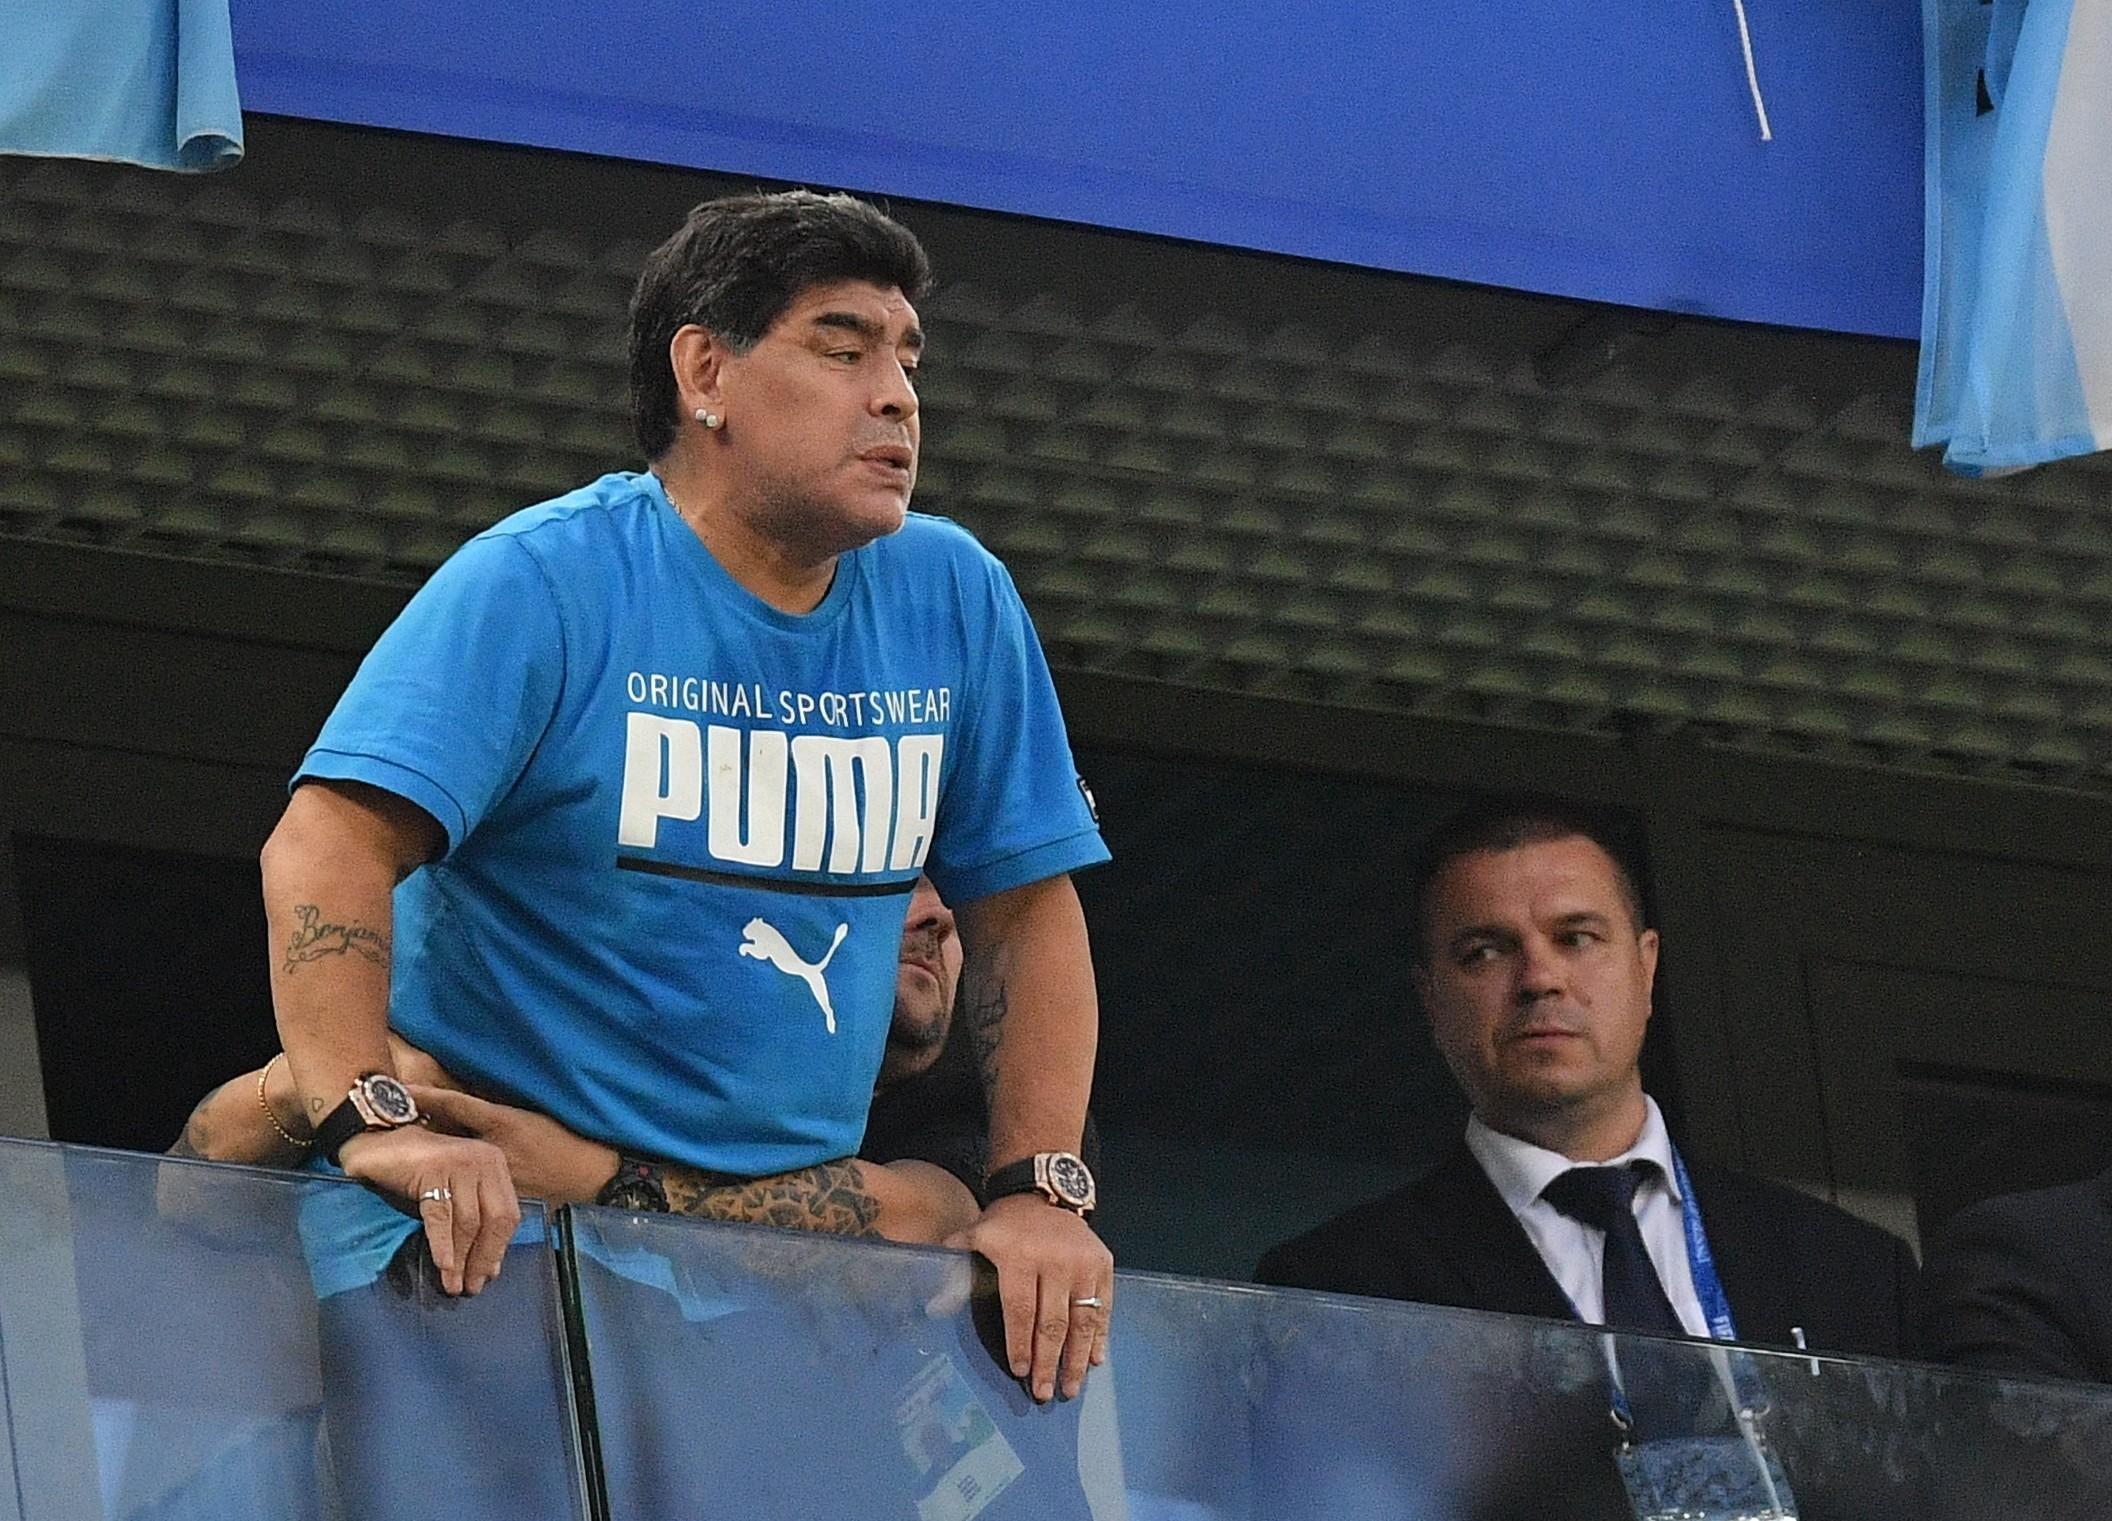 Фото: РИА Новости/Владимир Песня